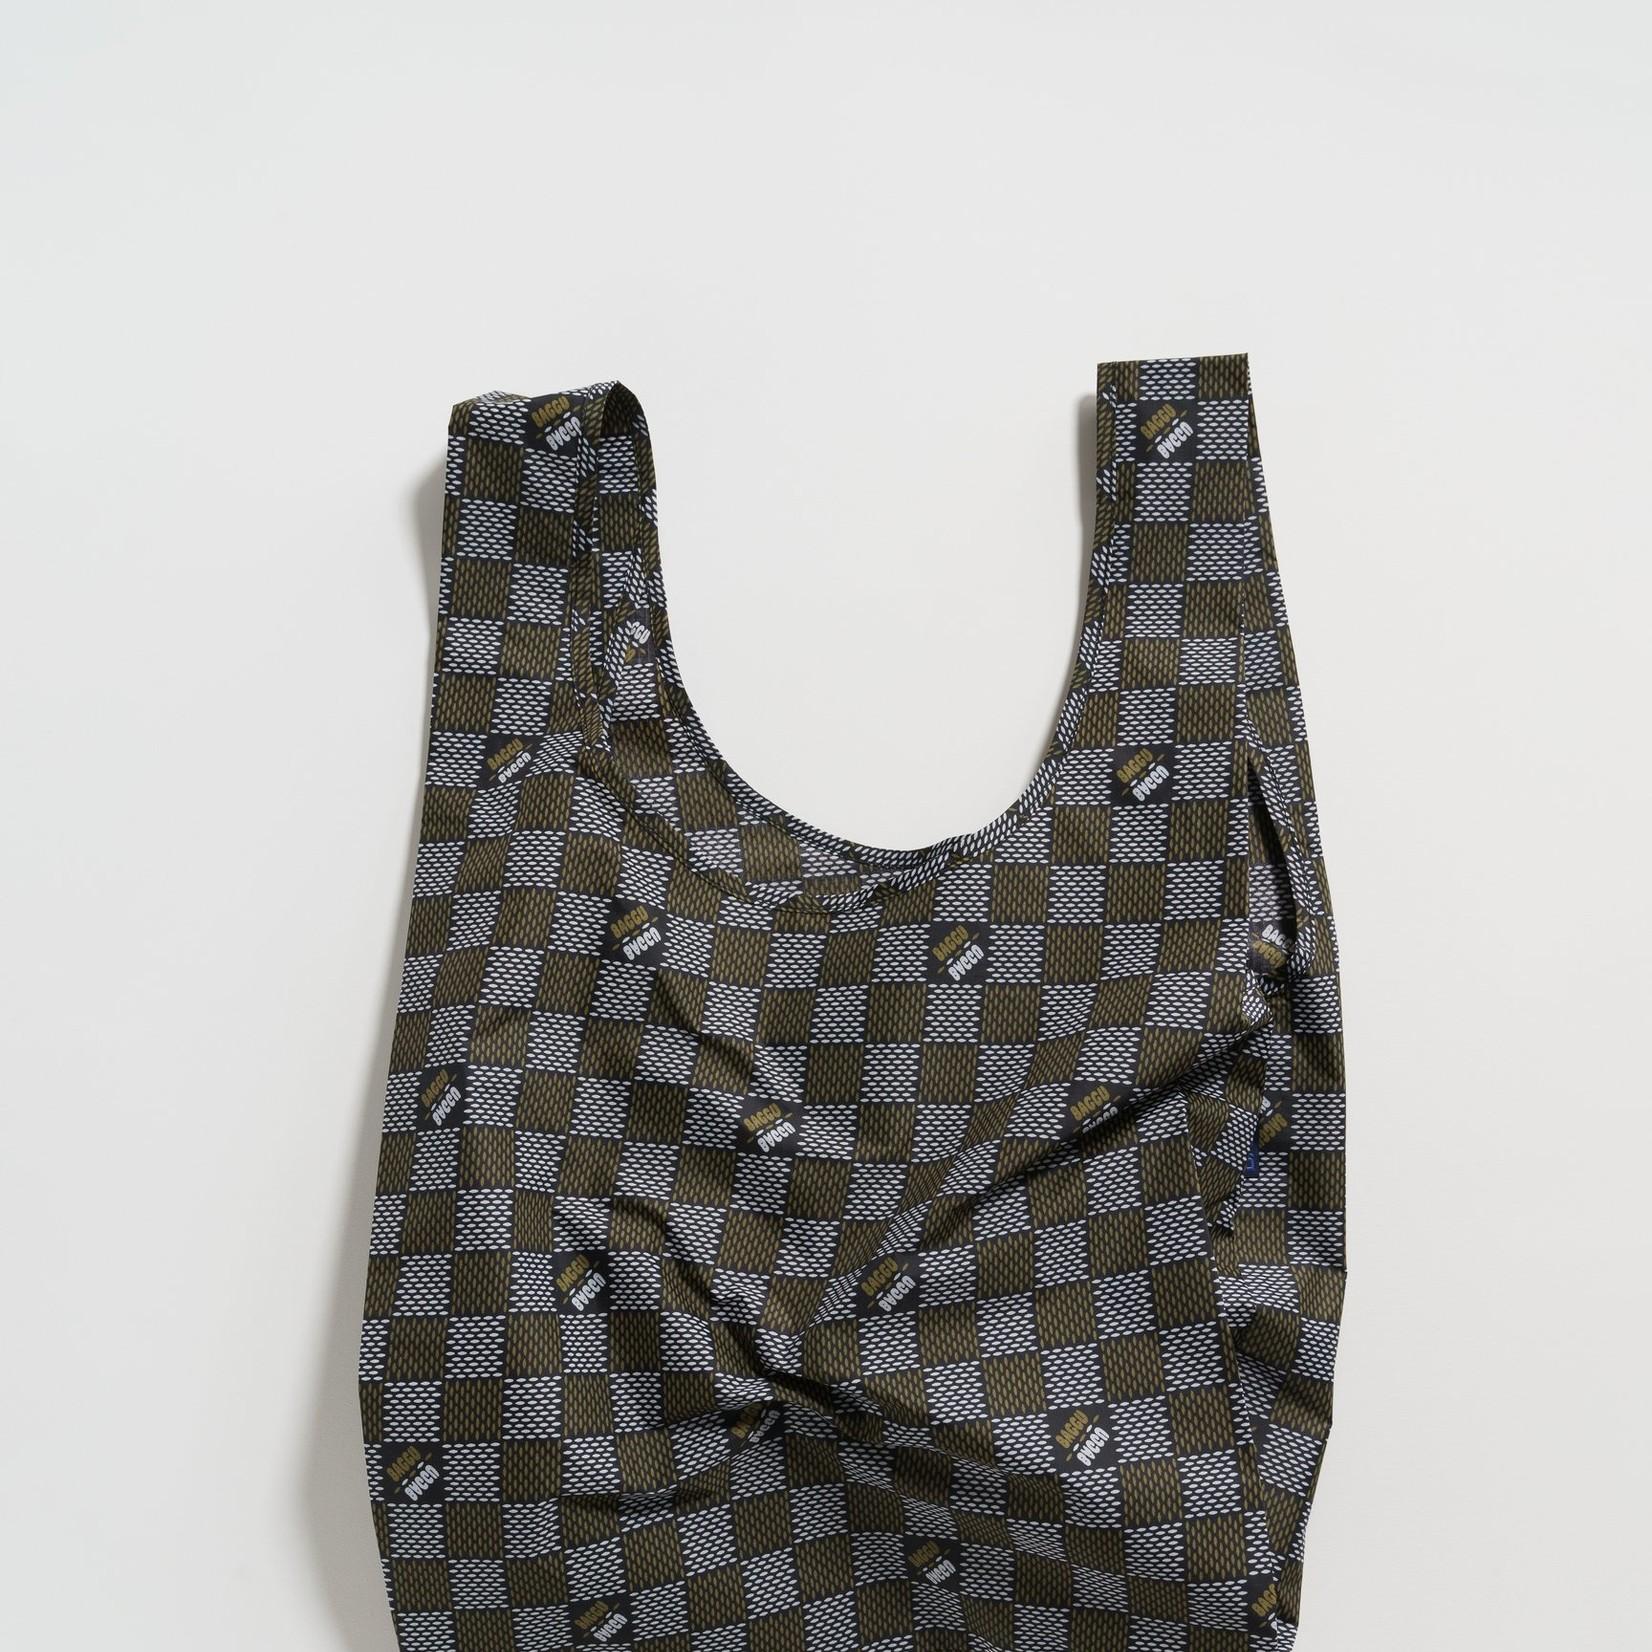 Baggu Baggu Reusable Bag Standard Woven Check